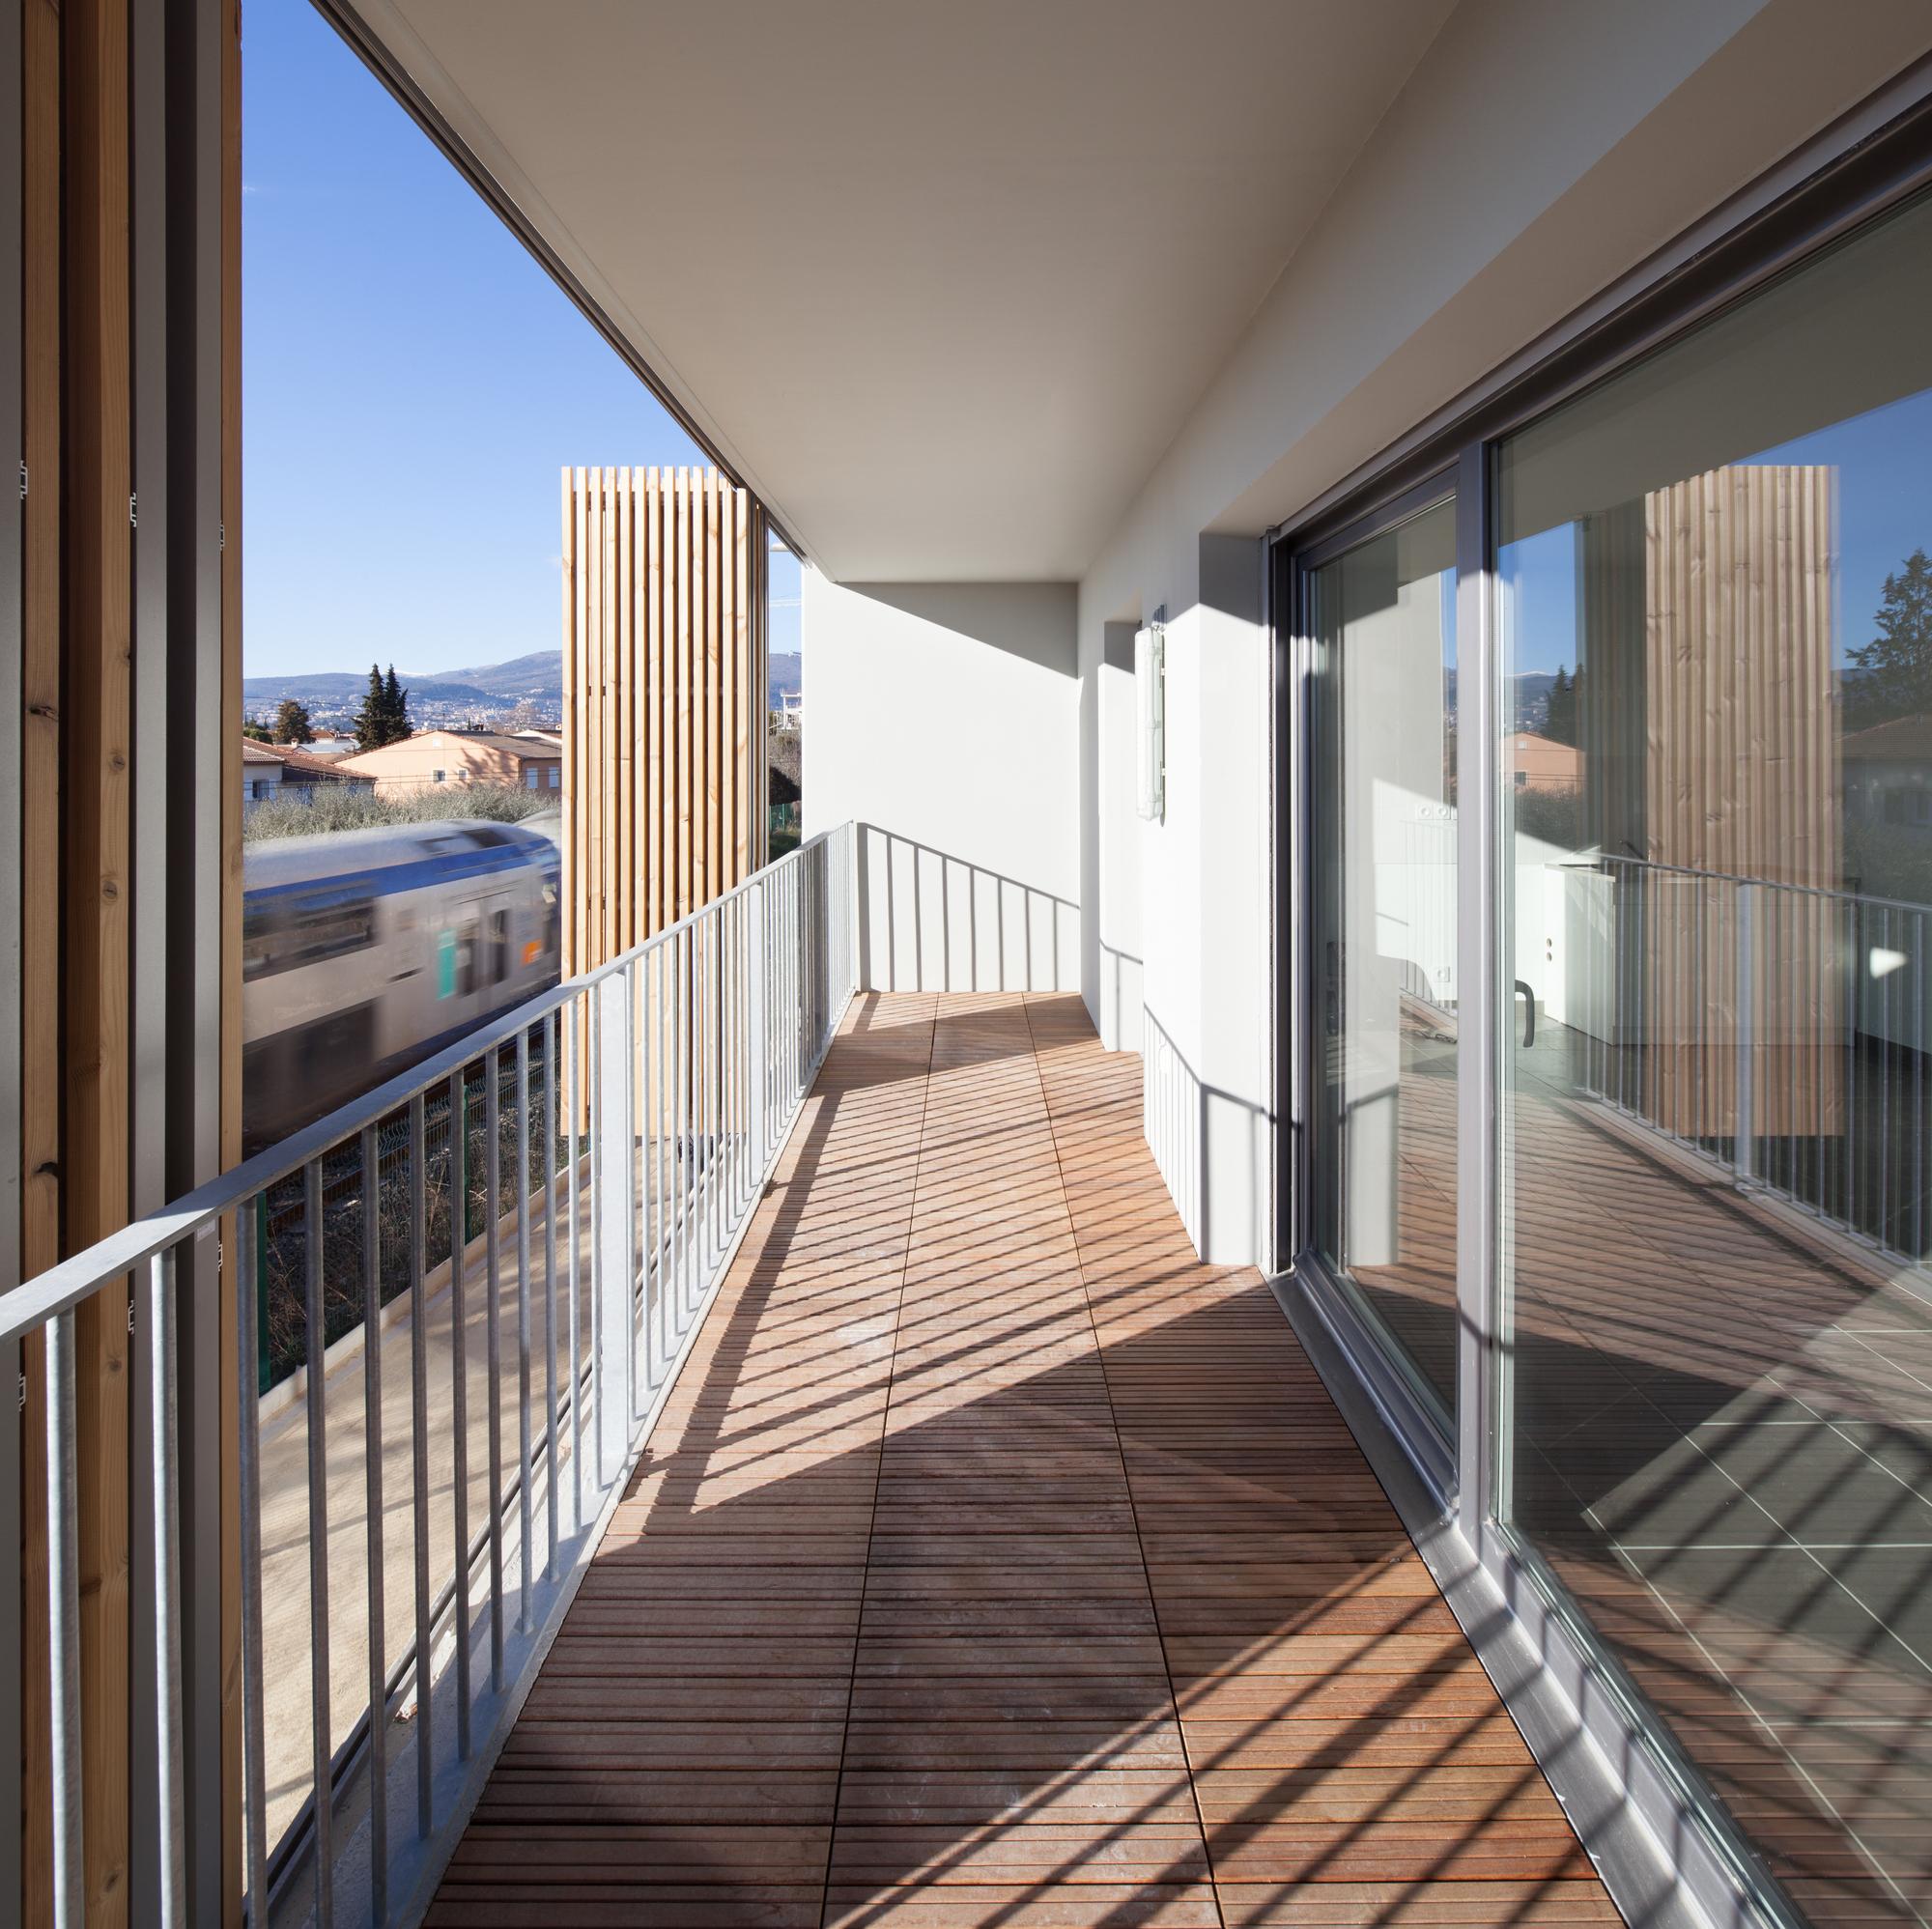 galer a de vivienda social tiendas en mouans sartoux comte et vollenweider architectes 14. Black Bedroom Furniture Sets. Home Design Ideas